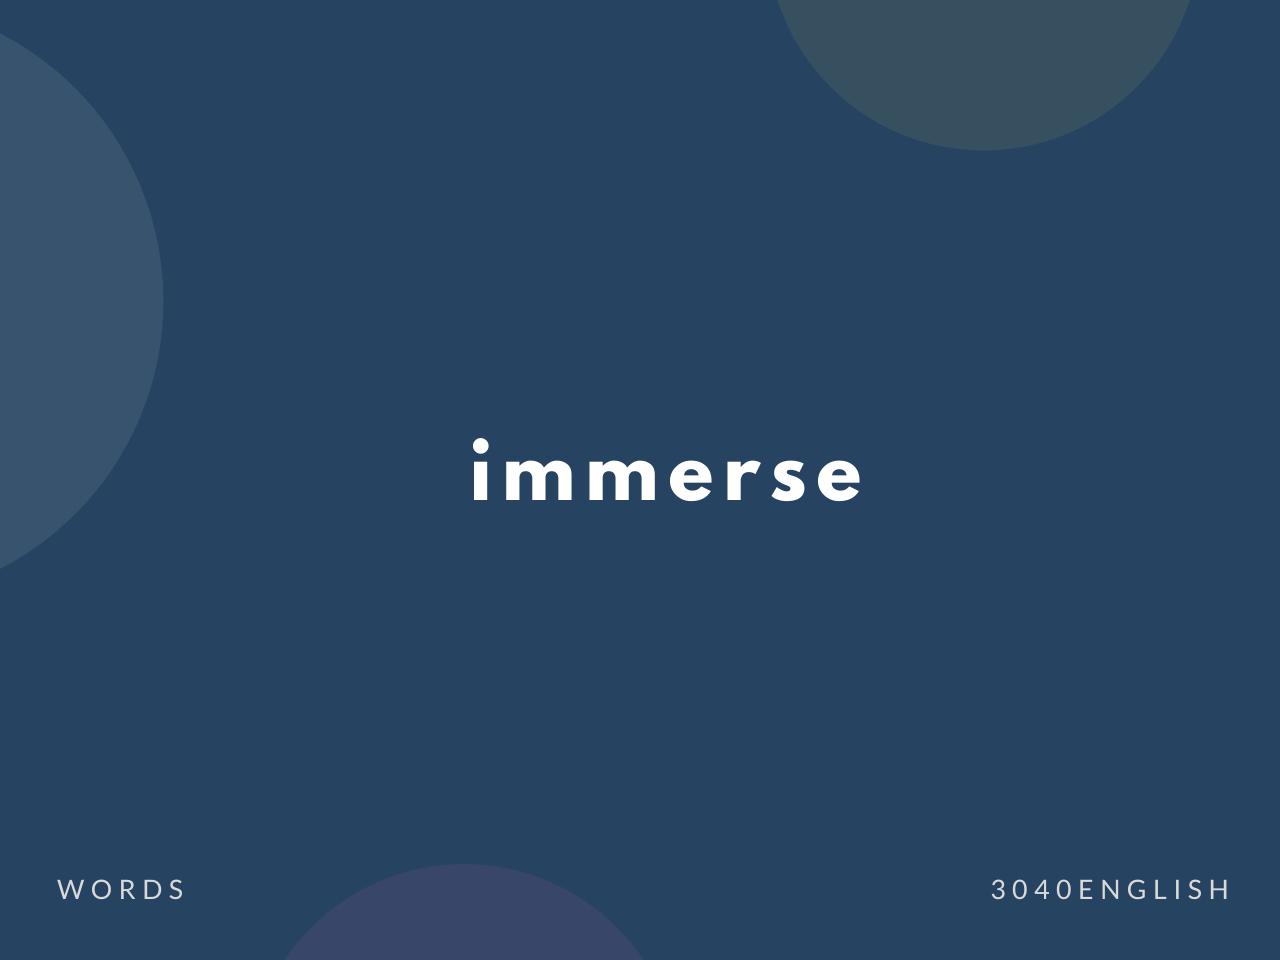 immerse の意味と簡単な使い方【音読用例文あり】